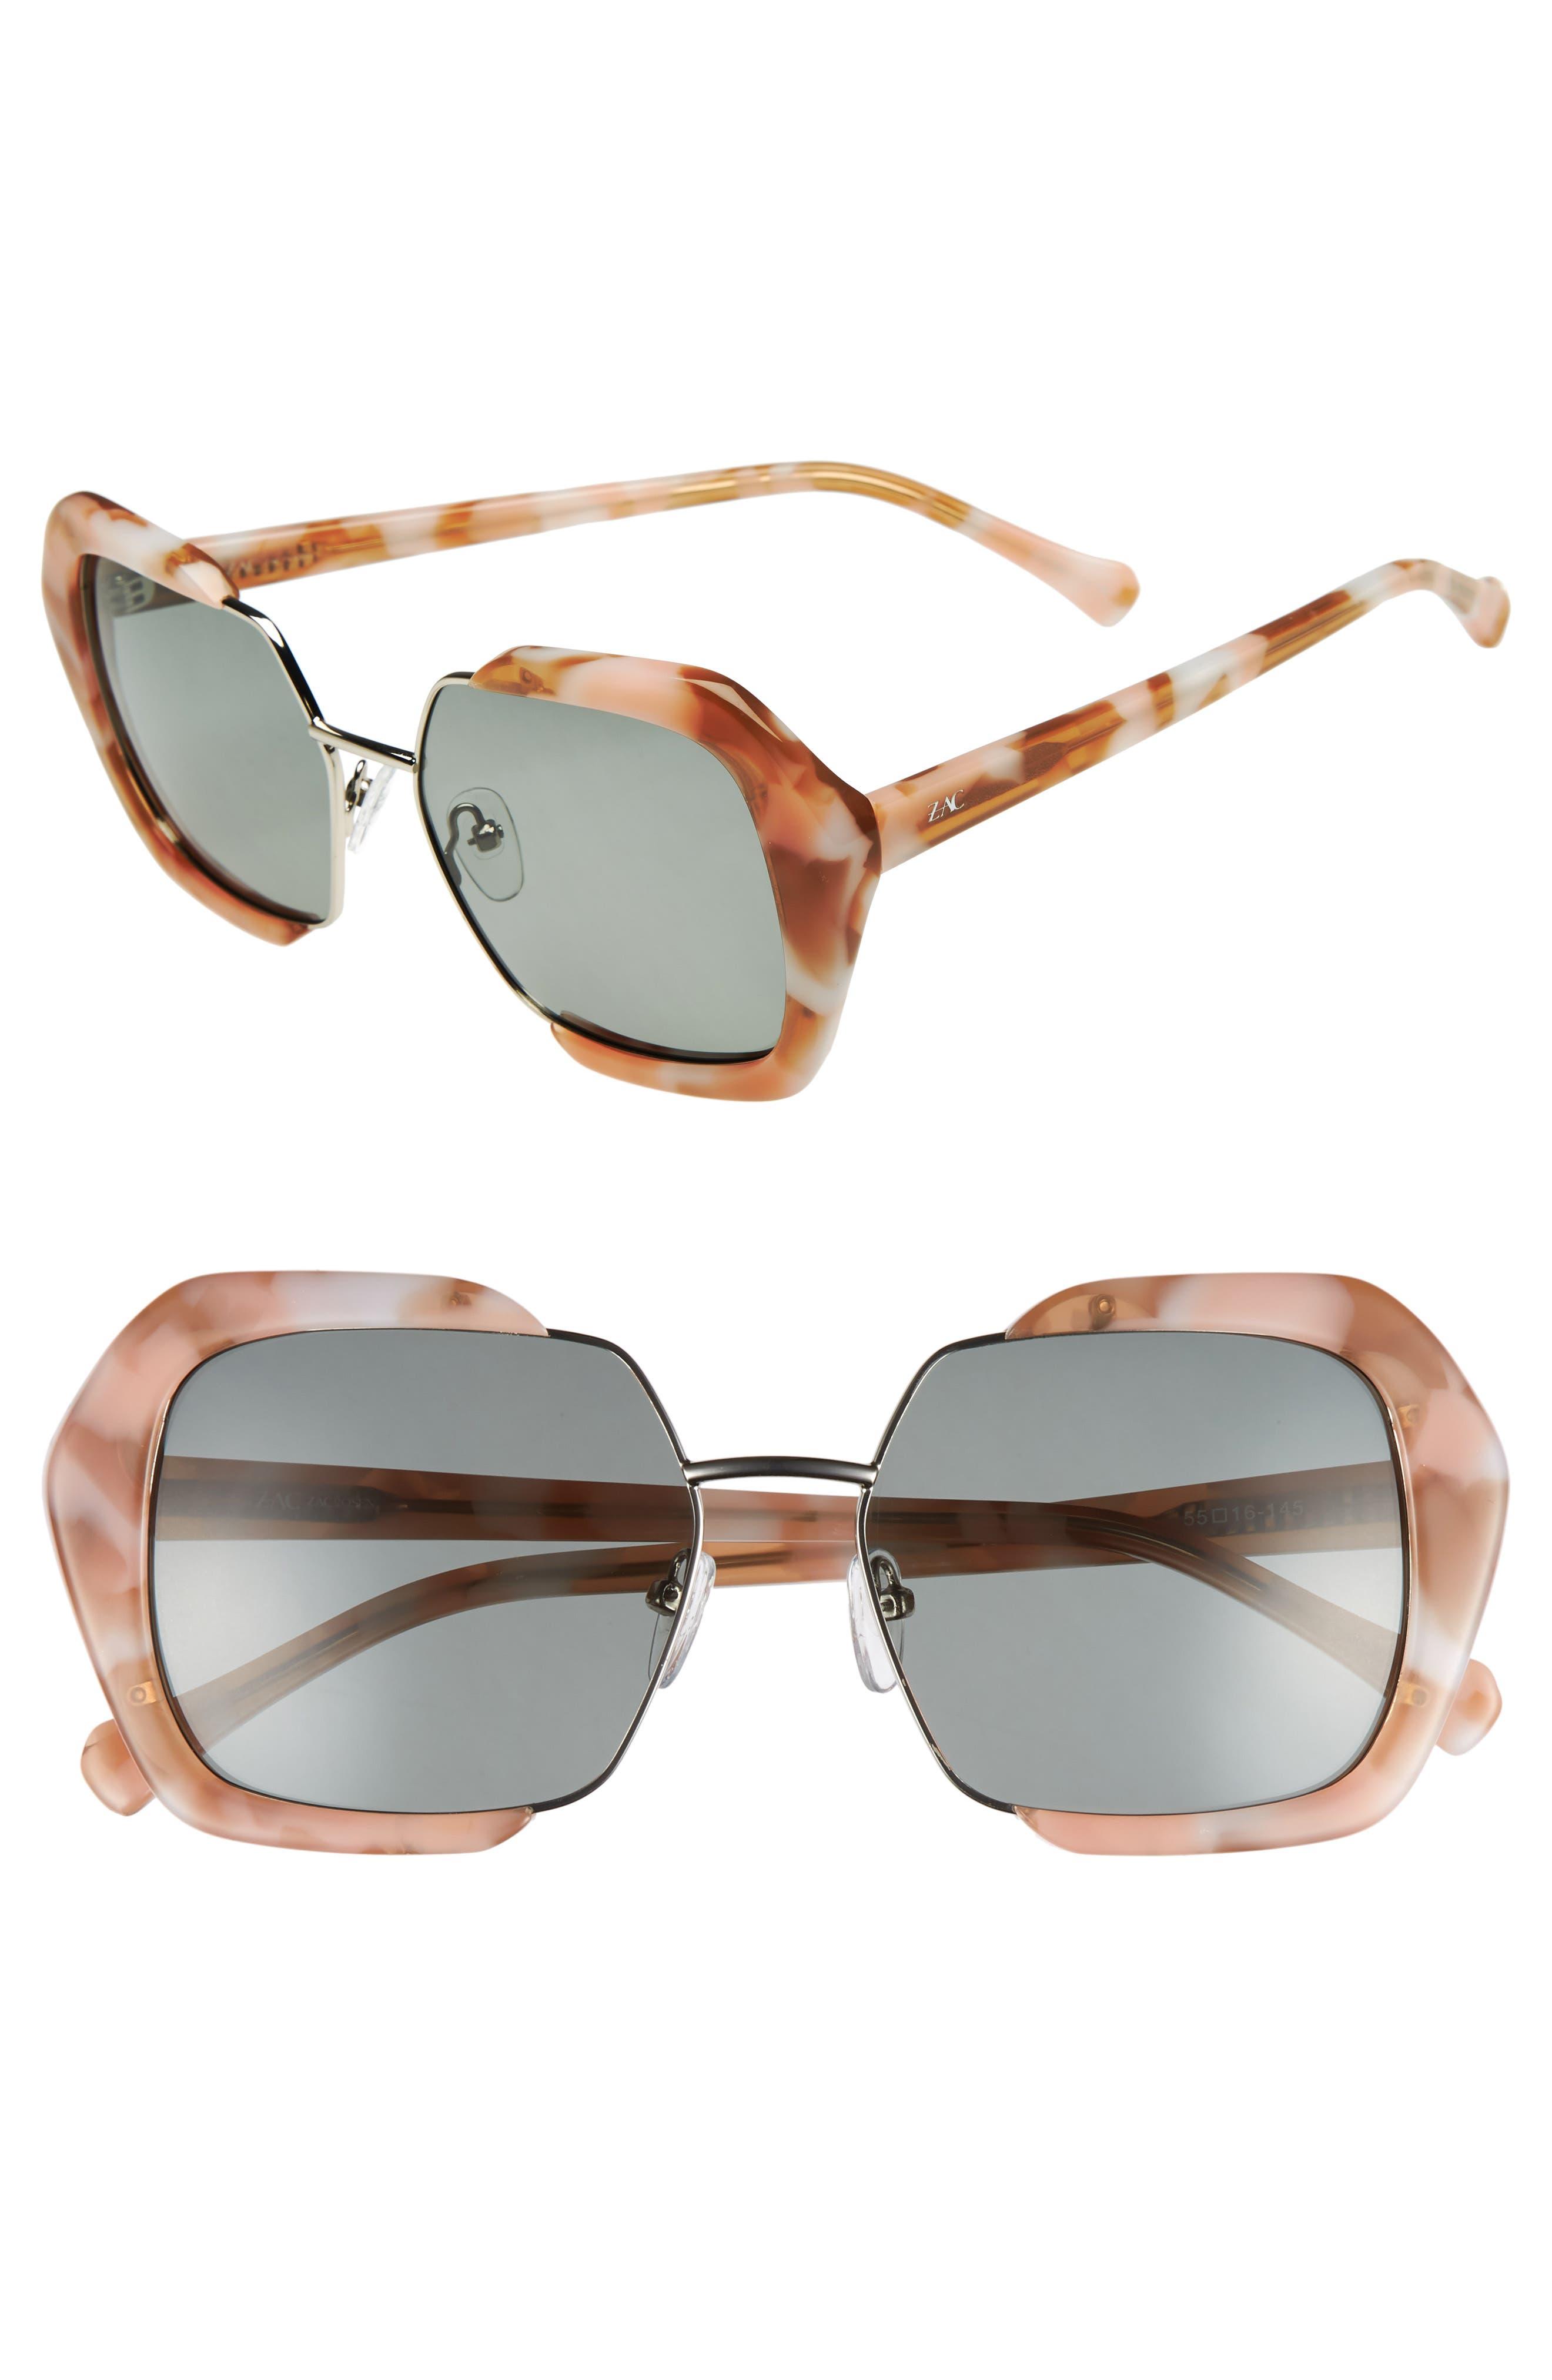 Isleen 55mm Polarized Sunglasses,                         Main,                         color, Pink/ Tortoise/ Gold